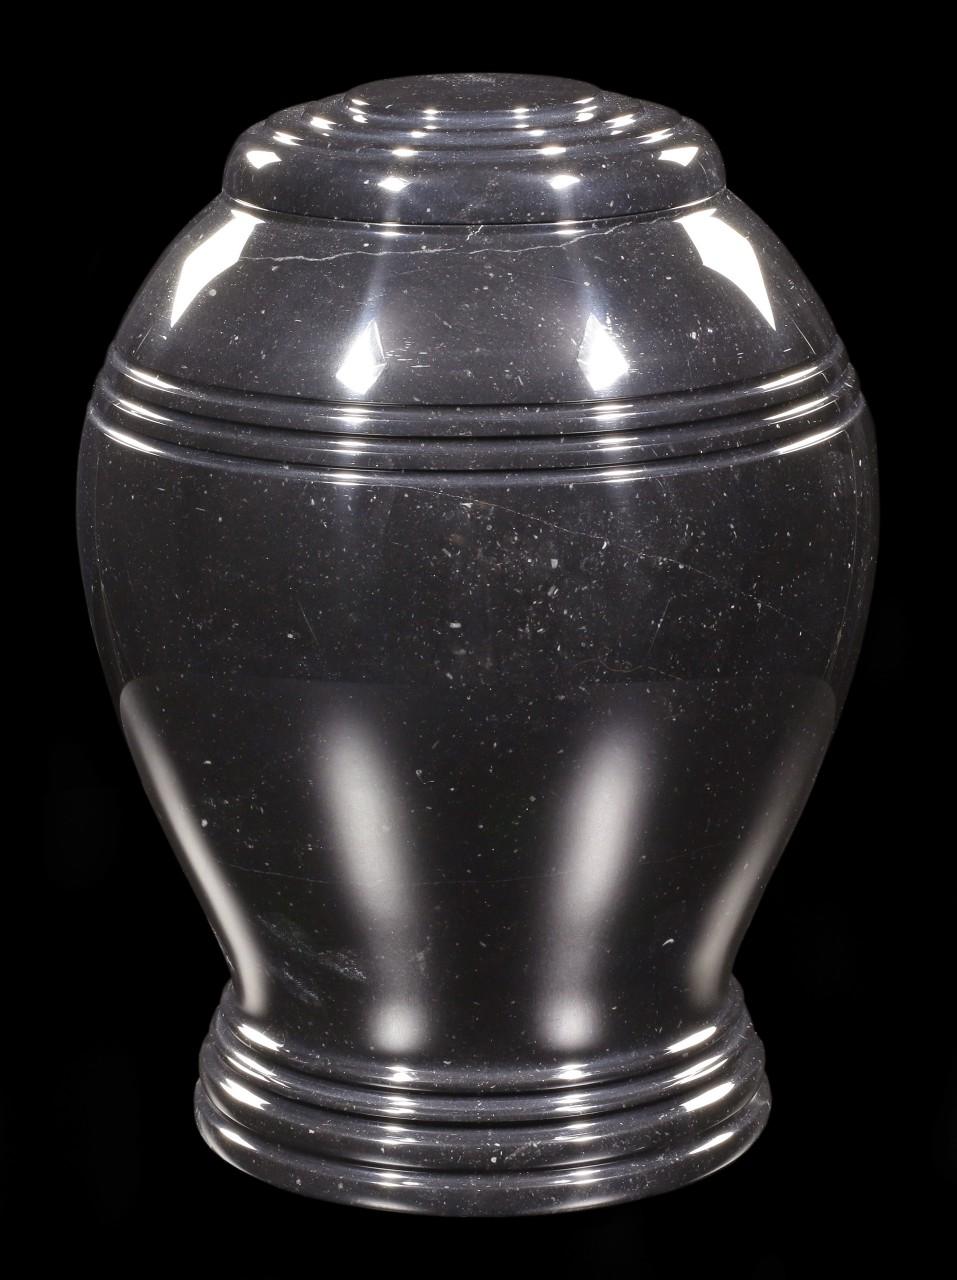 Schwarze Marmor Tier Urne - Charisma